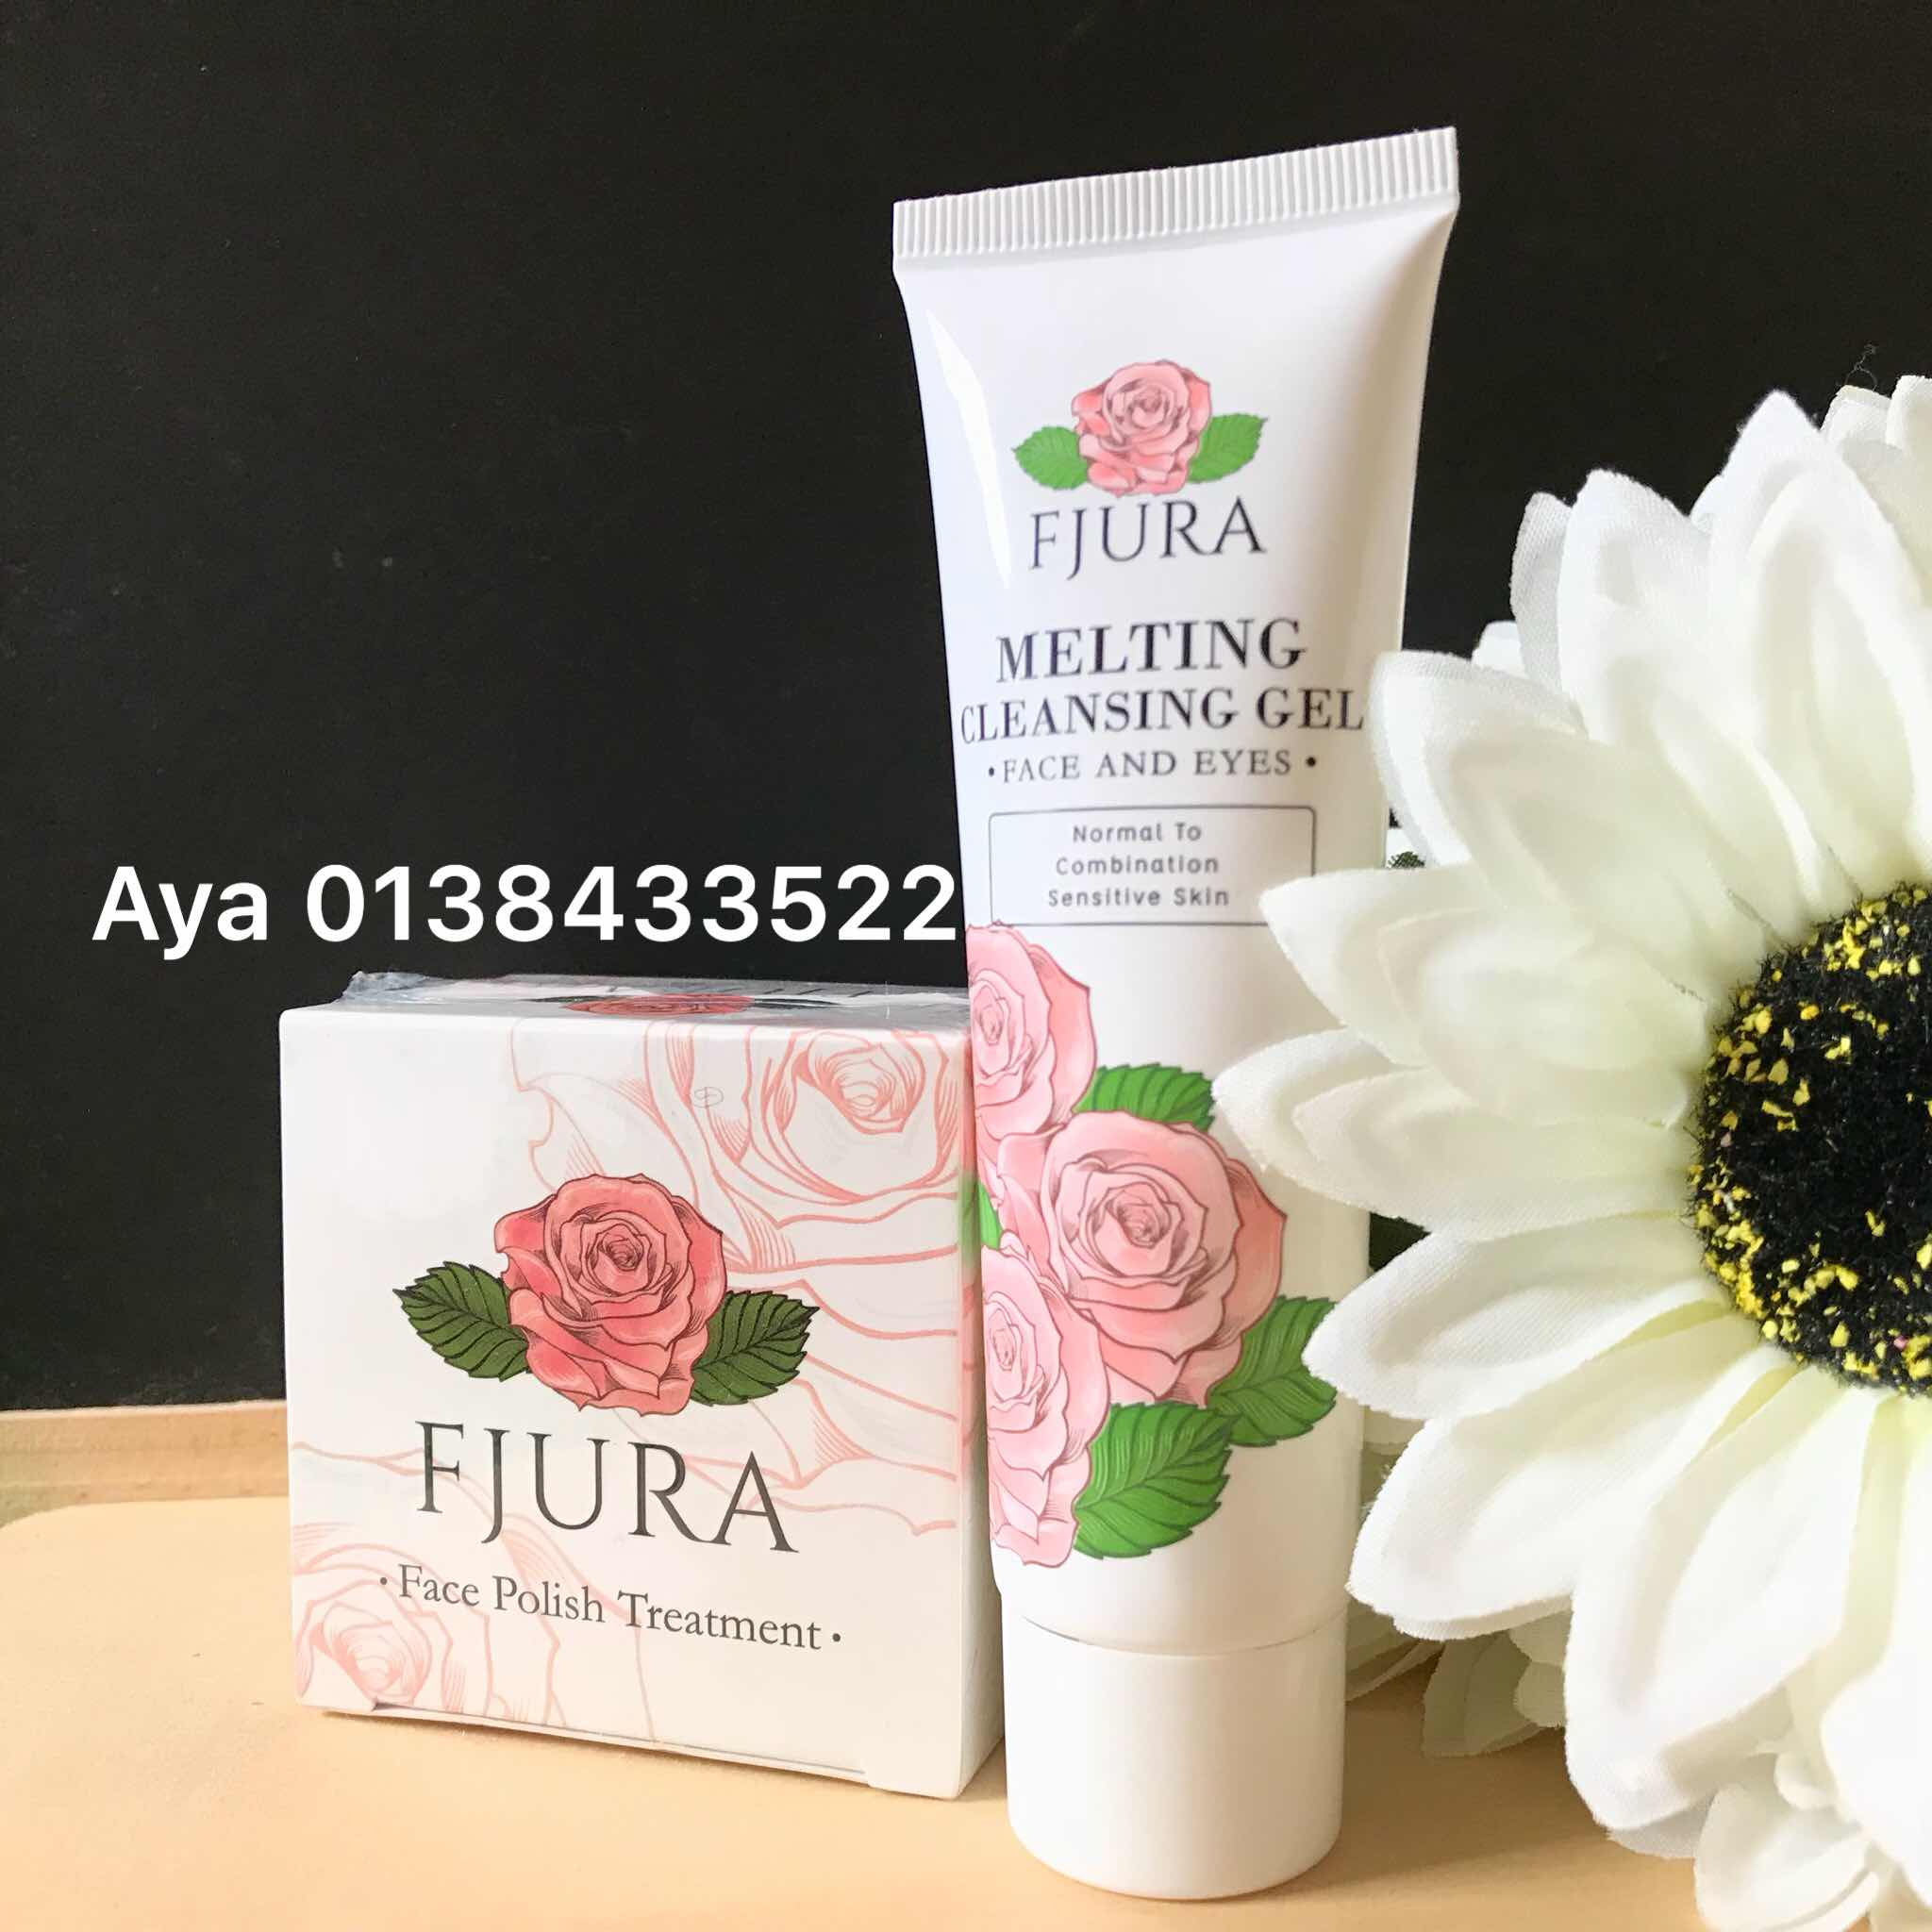 fjura face polish treatment